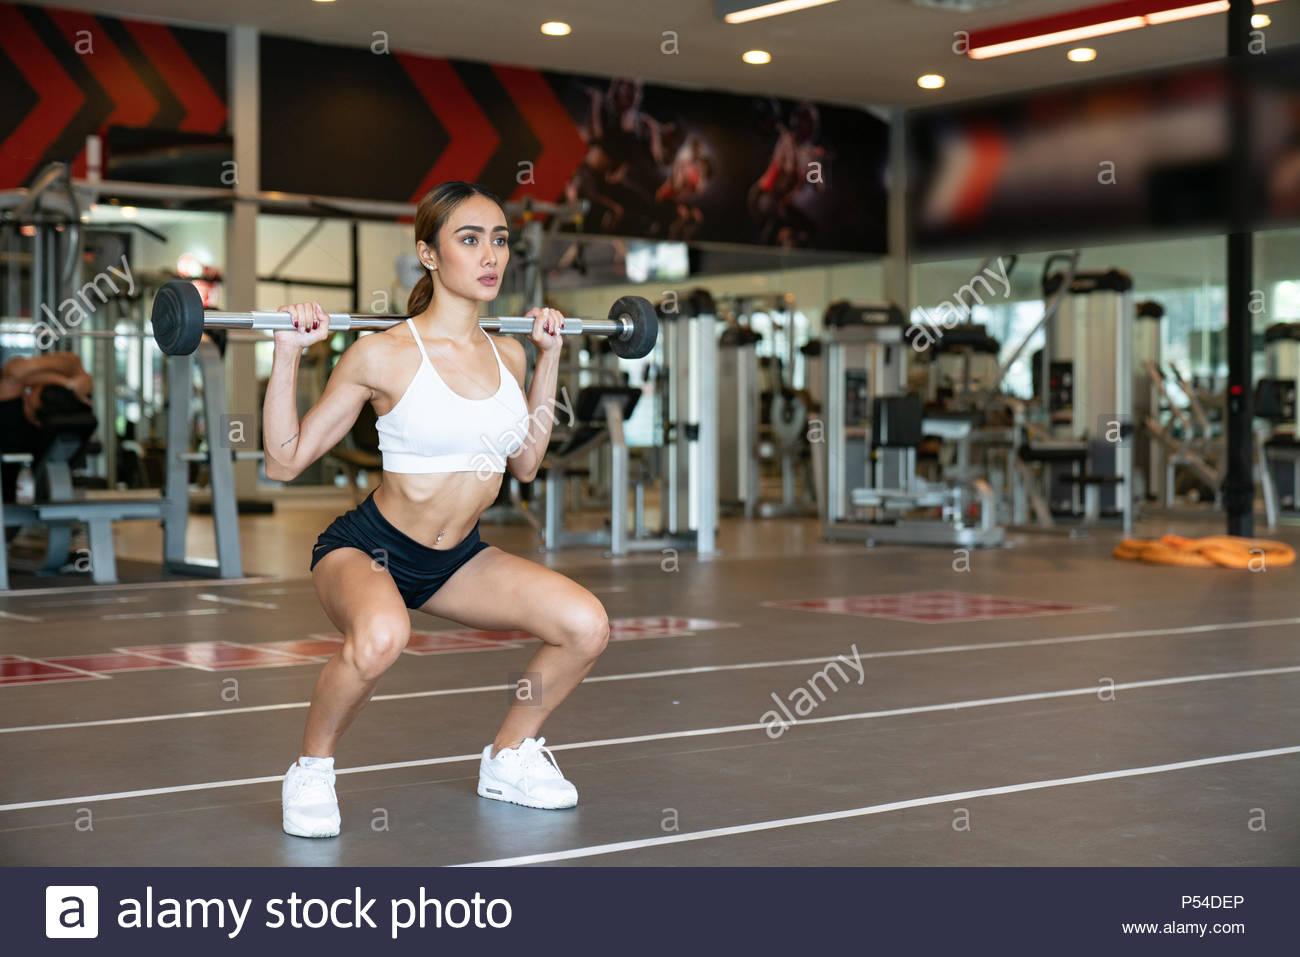 Close Up of young woman fitness exercice exécuté avec l'exercice-machine Cable Crossover dans une salle de sport. Photo Stock